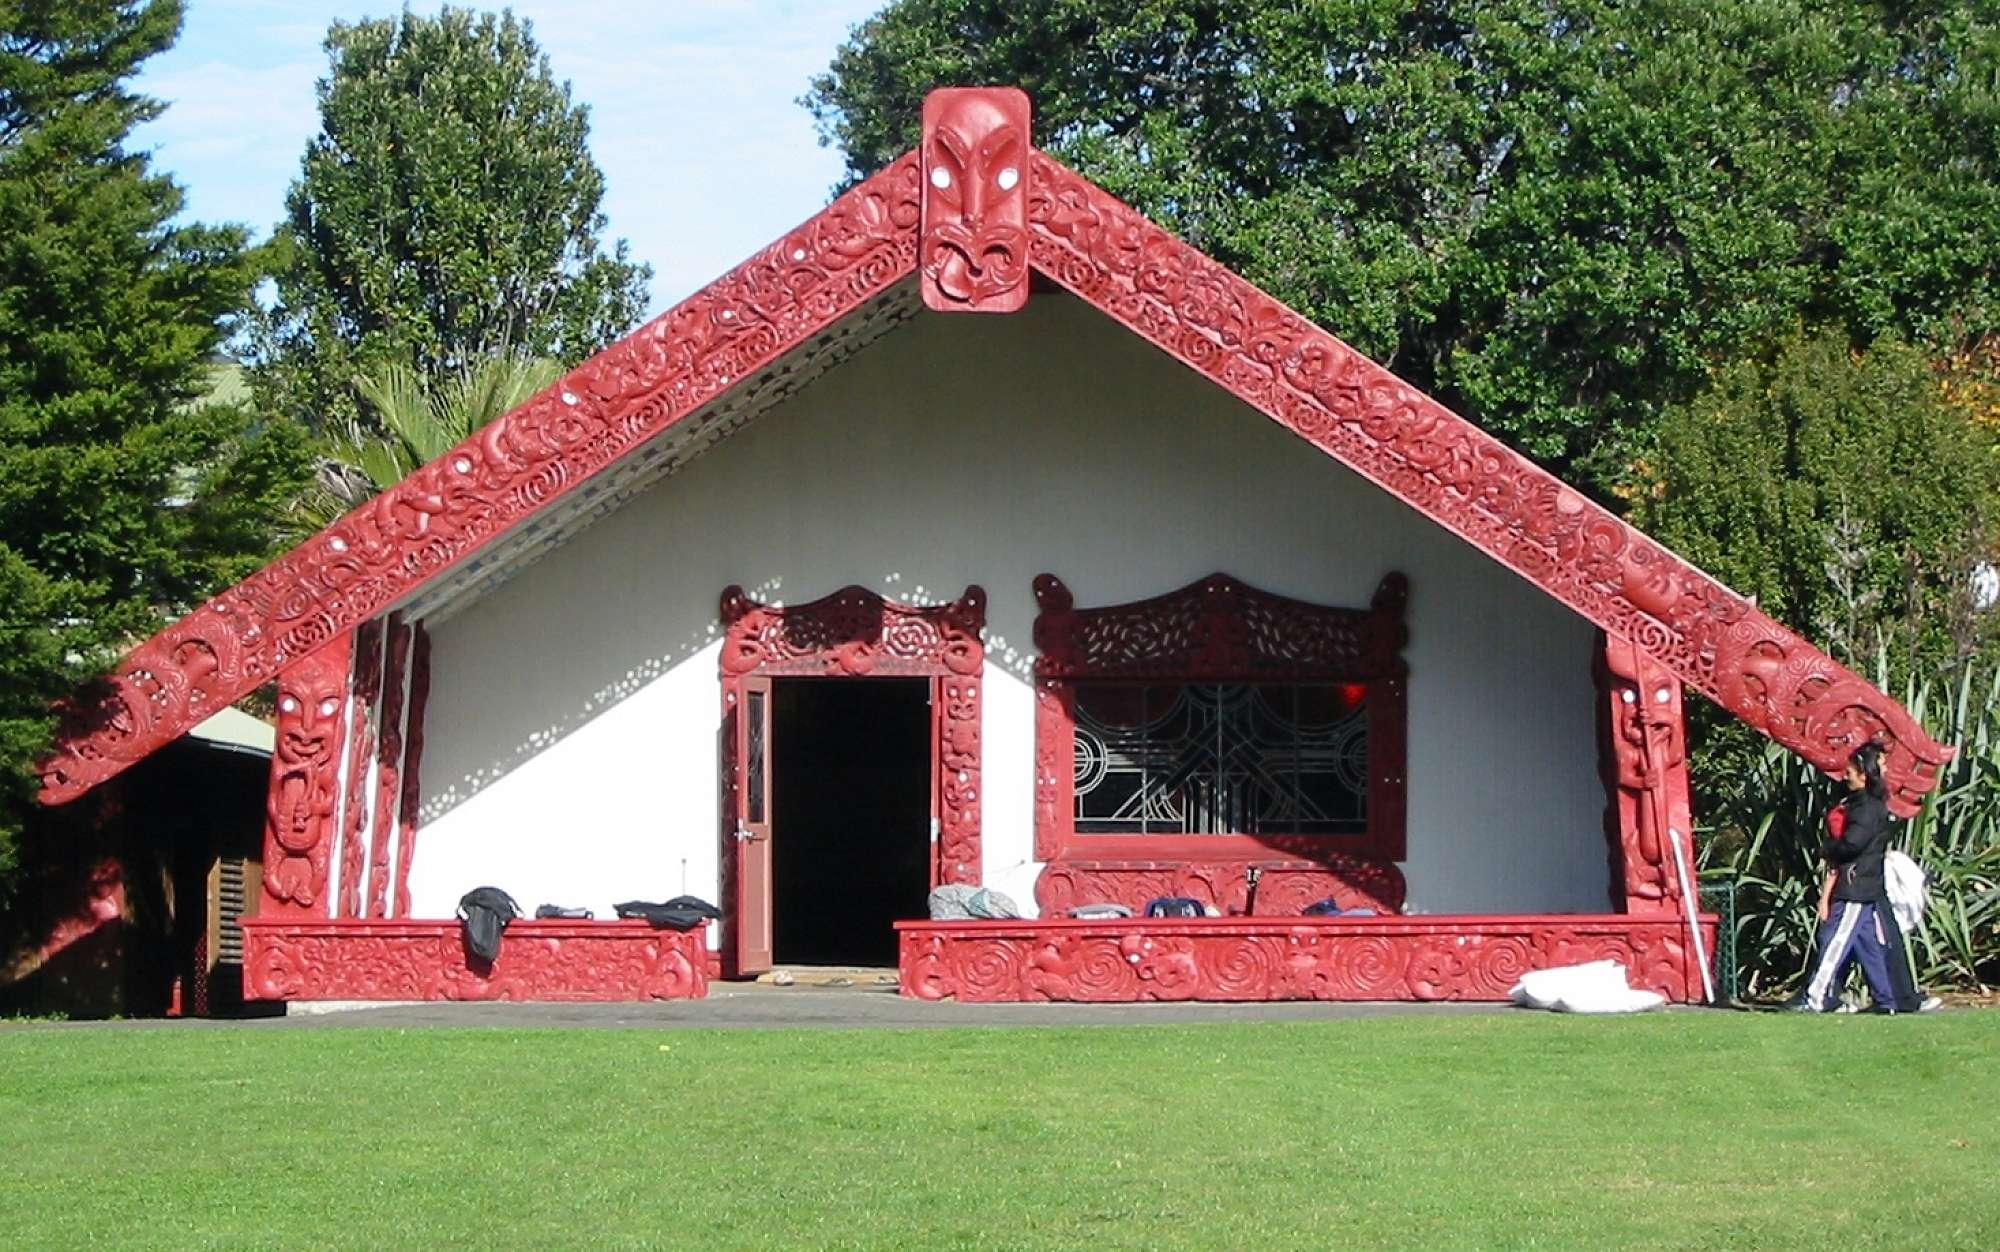 Image courtesy of University of Auckland via Wikimedia Commons